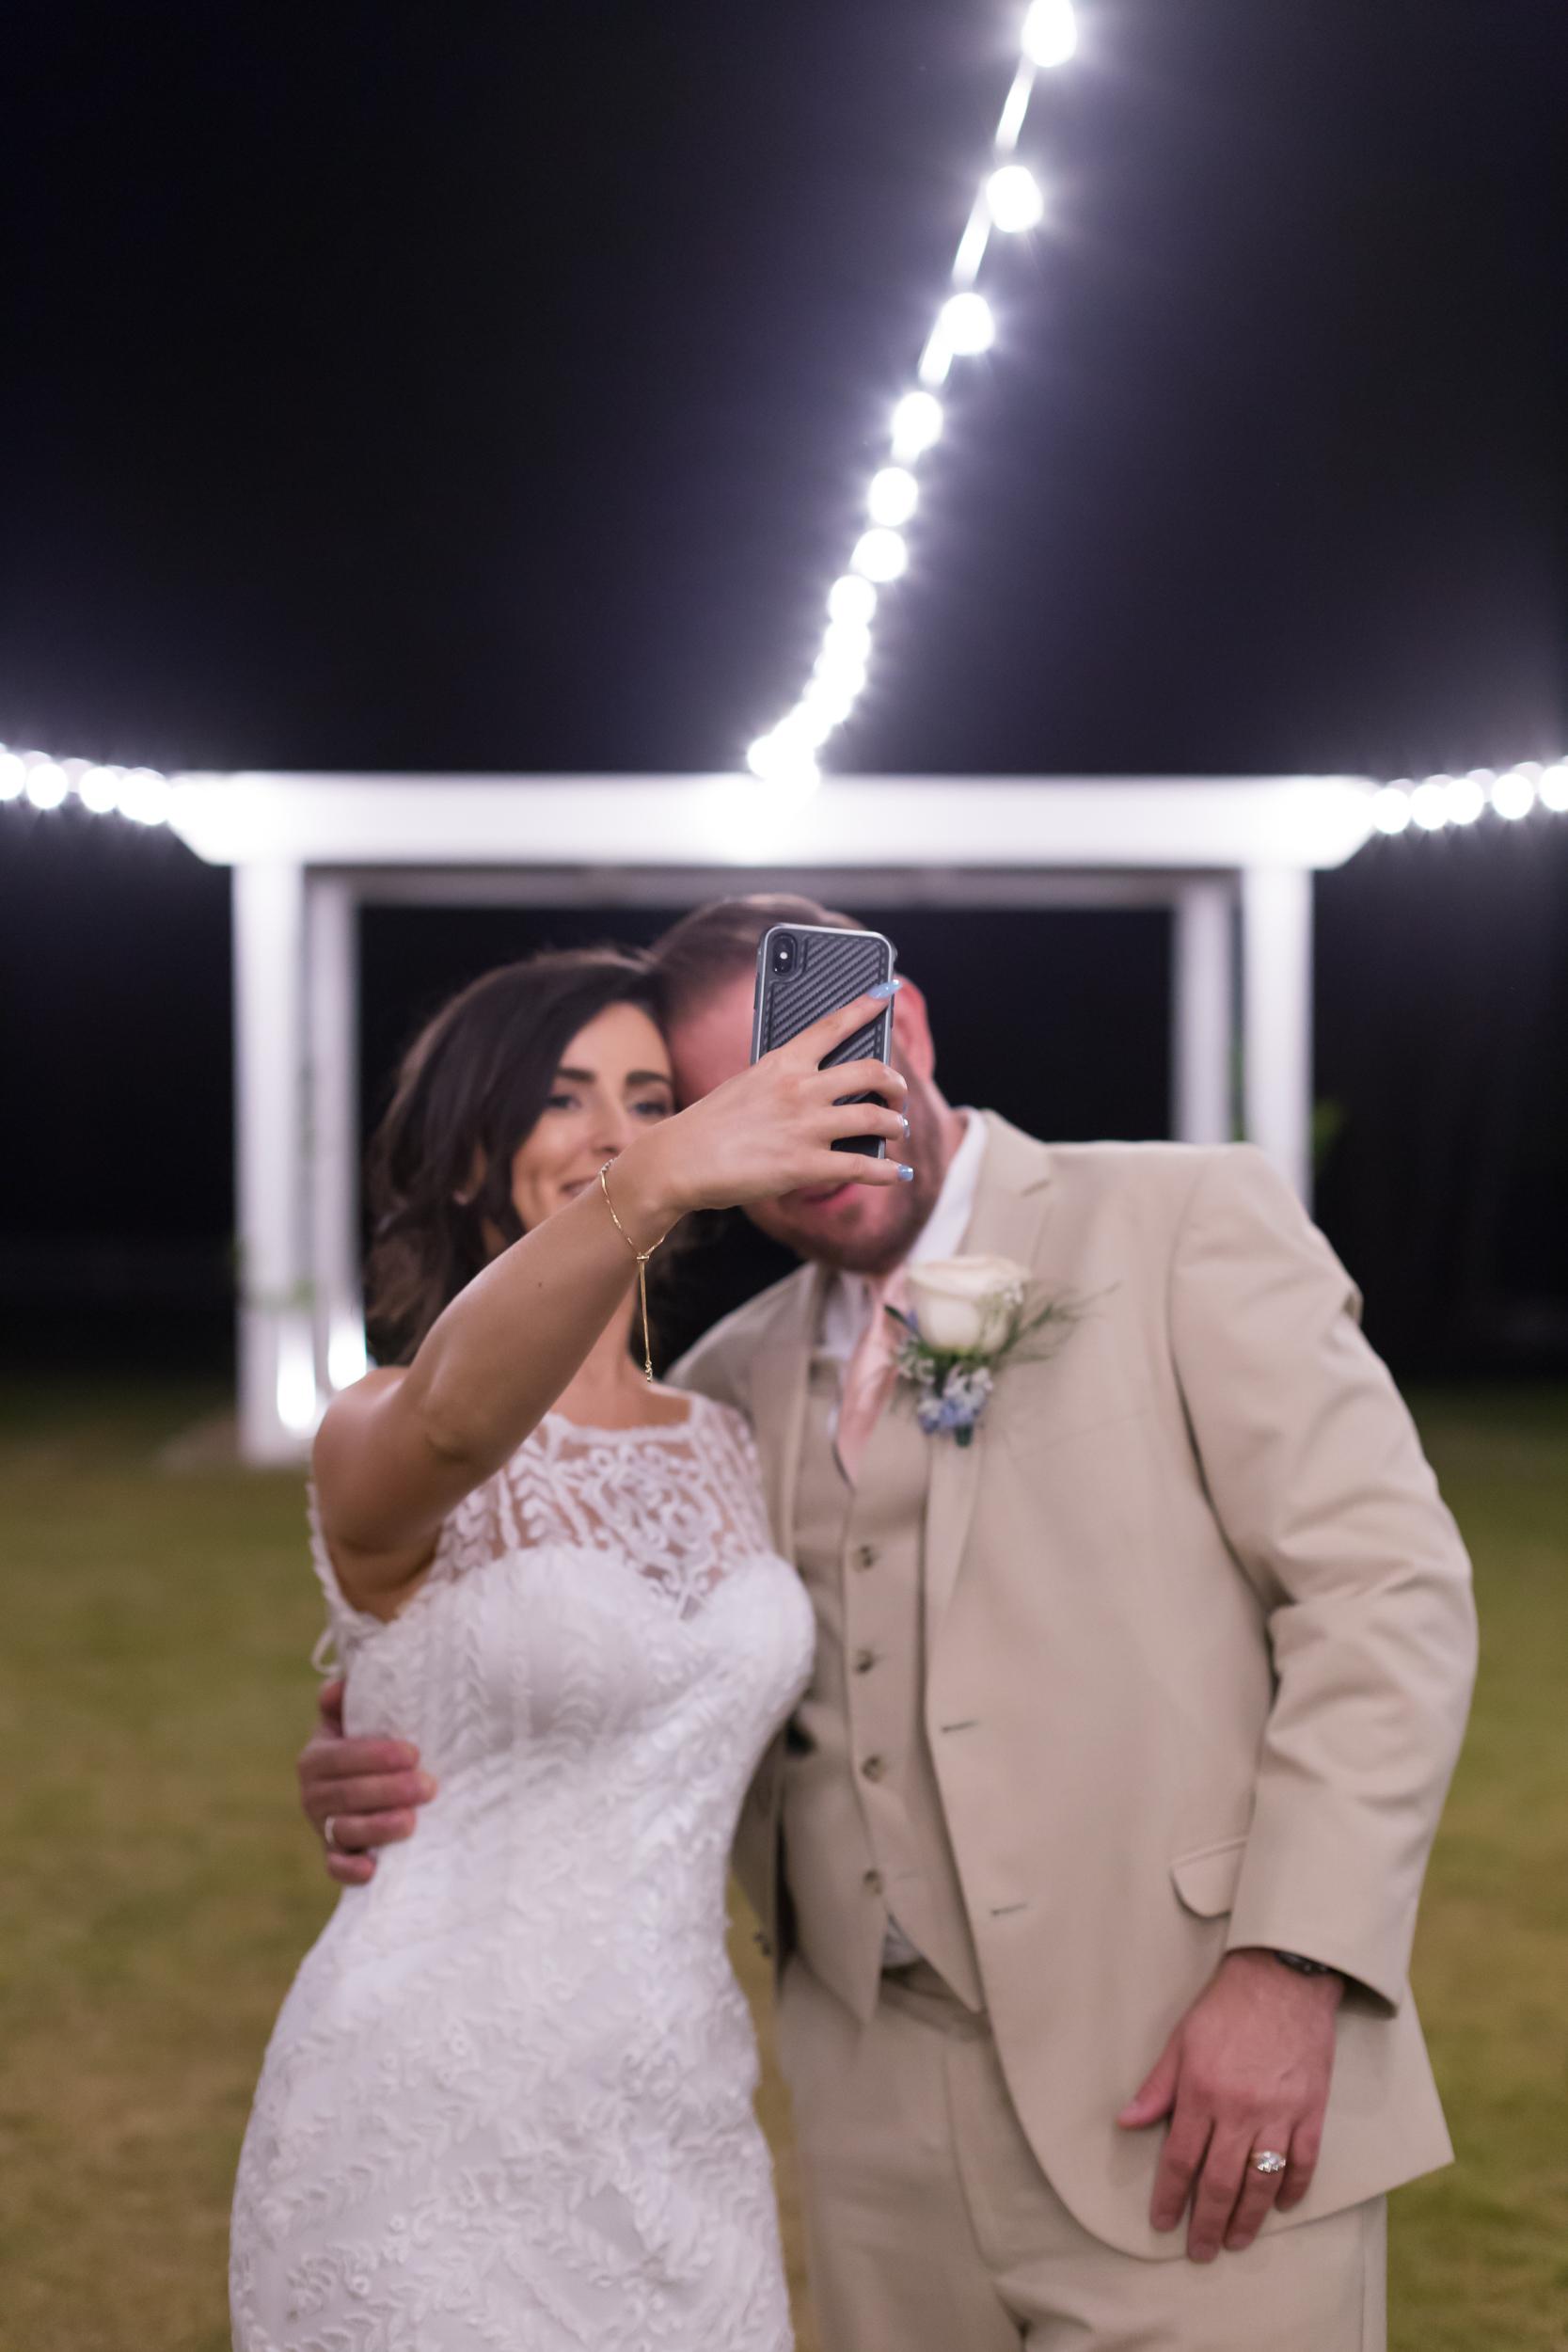 Zihlman-East TX Wedding_Kelsie Hendricks Photography_The Folmar Tyler Texas-145.jpg